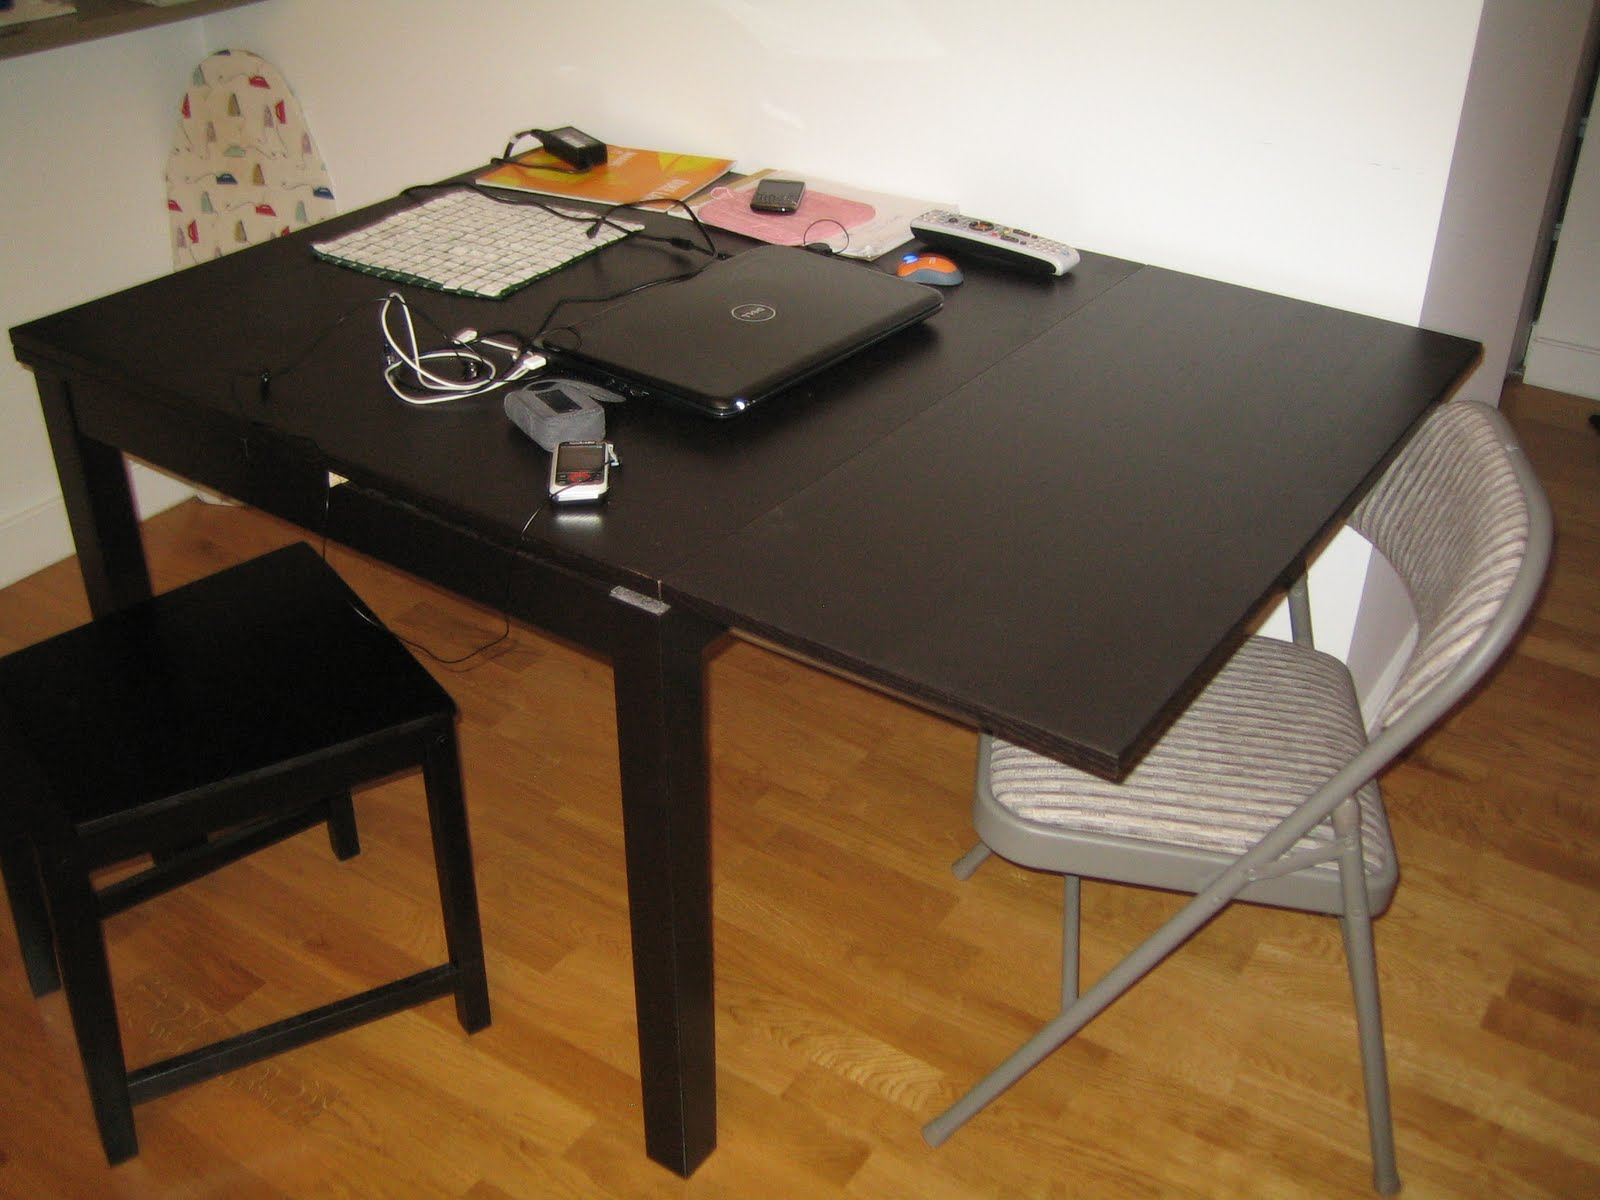 roosevelt island listings moving sale ikea tv stand dining table desk. Black Bedroom Furniture Sets. Home Design Ideas